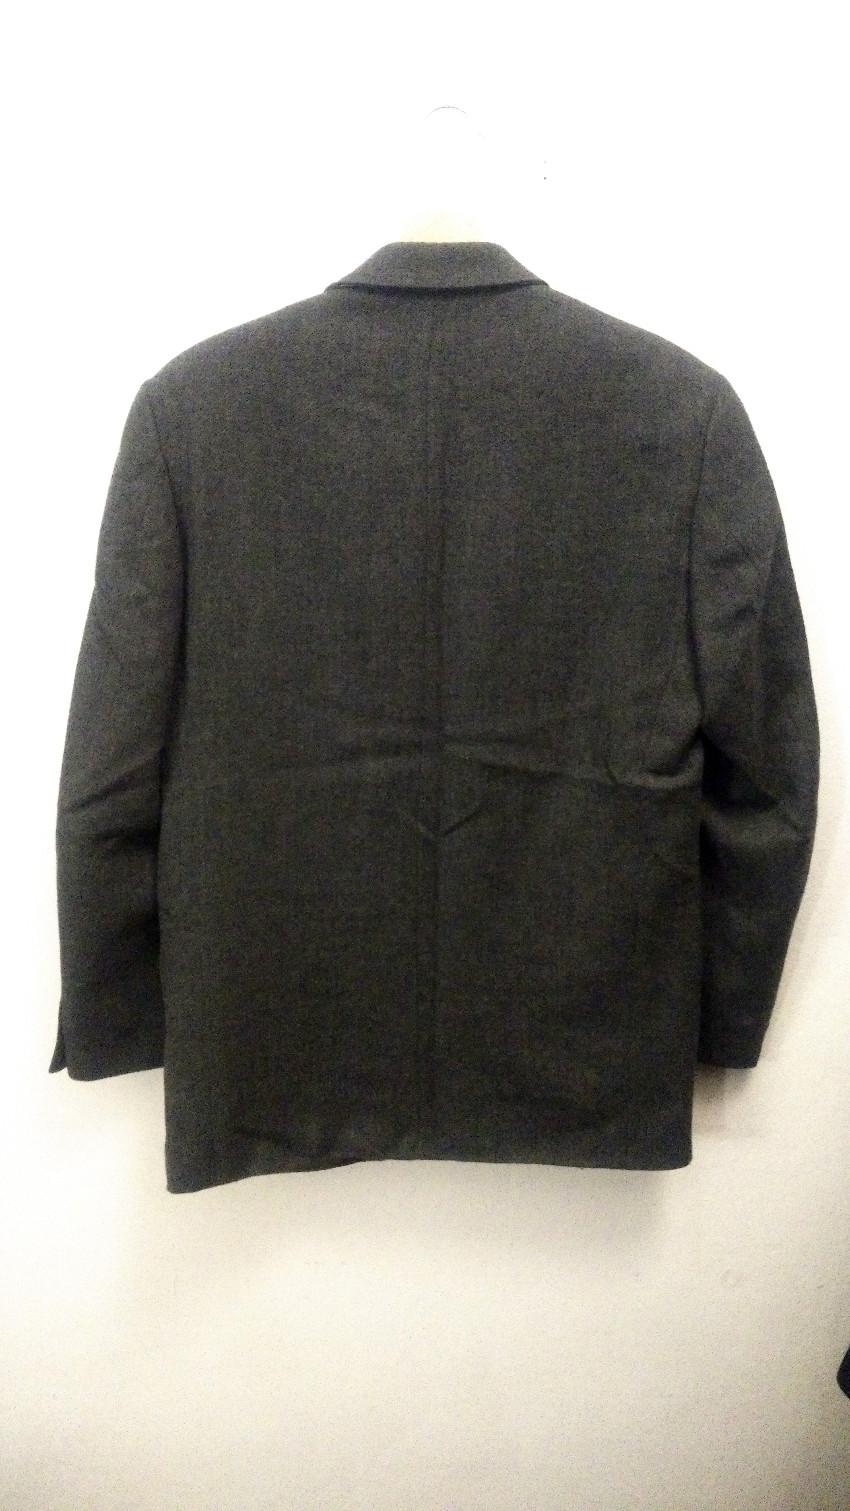 528b10d16c0 Kenzo Homme Wool Blazer. 20. 123456